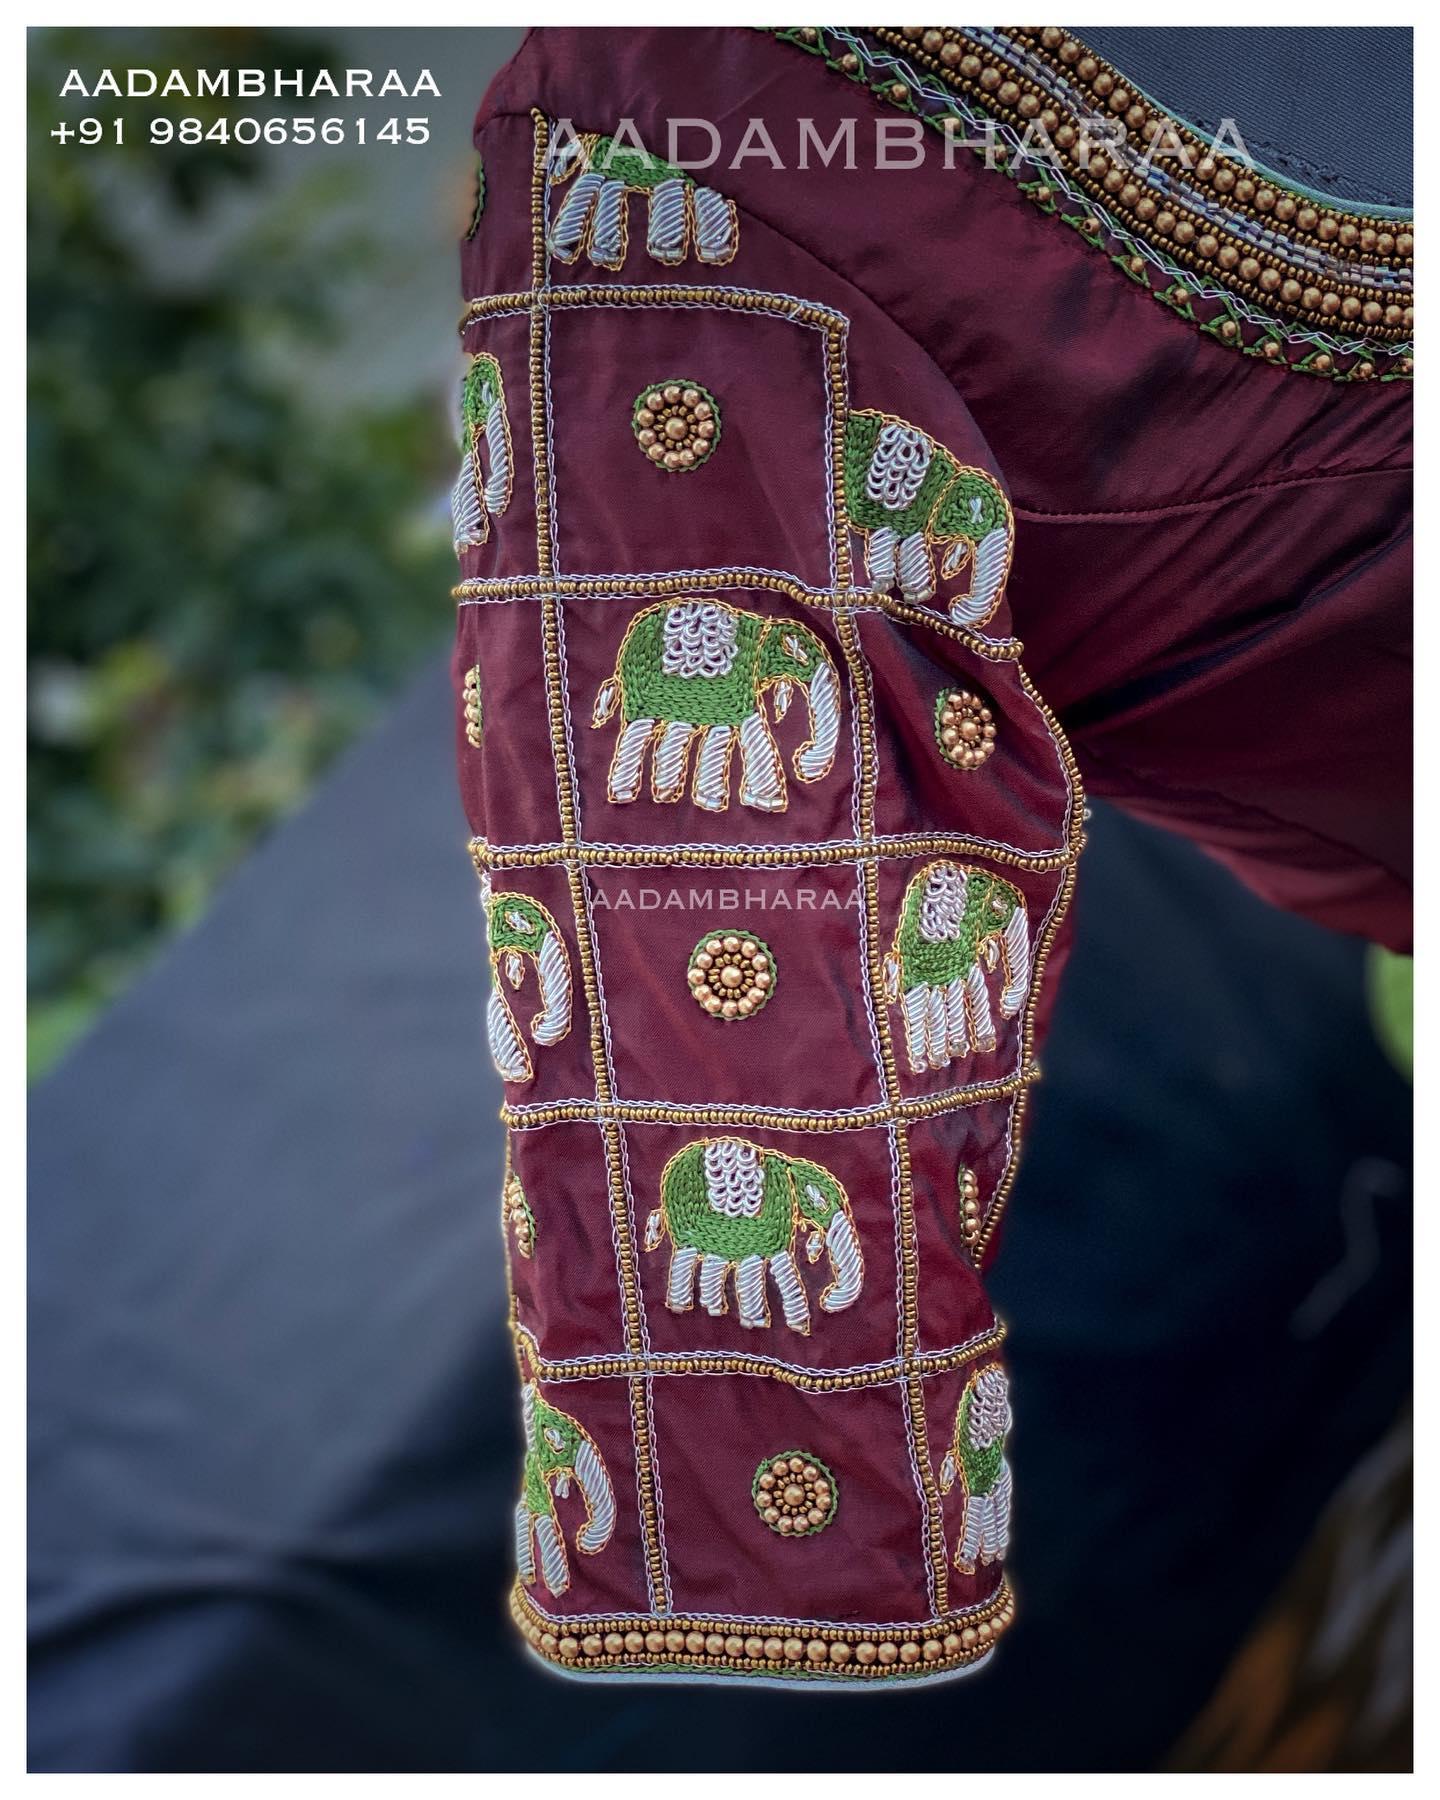 Maroon Bridal Blouse with Zardosi Embroidered  Elephant Motifs. 2021-07-07